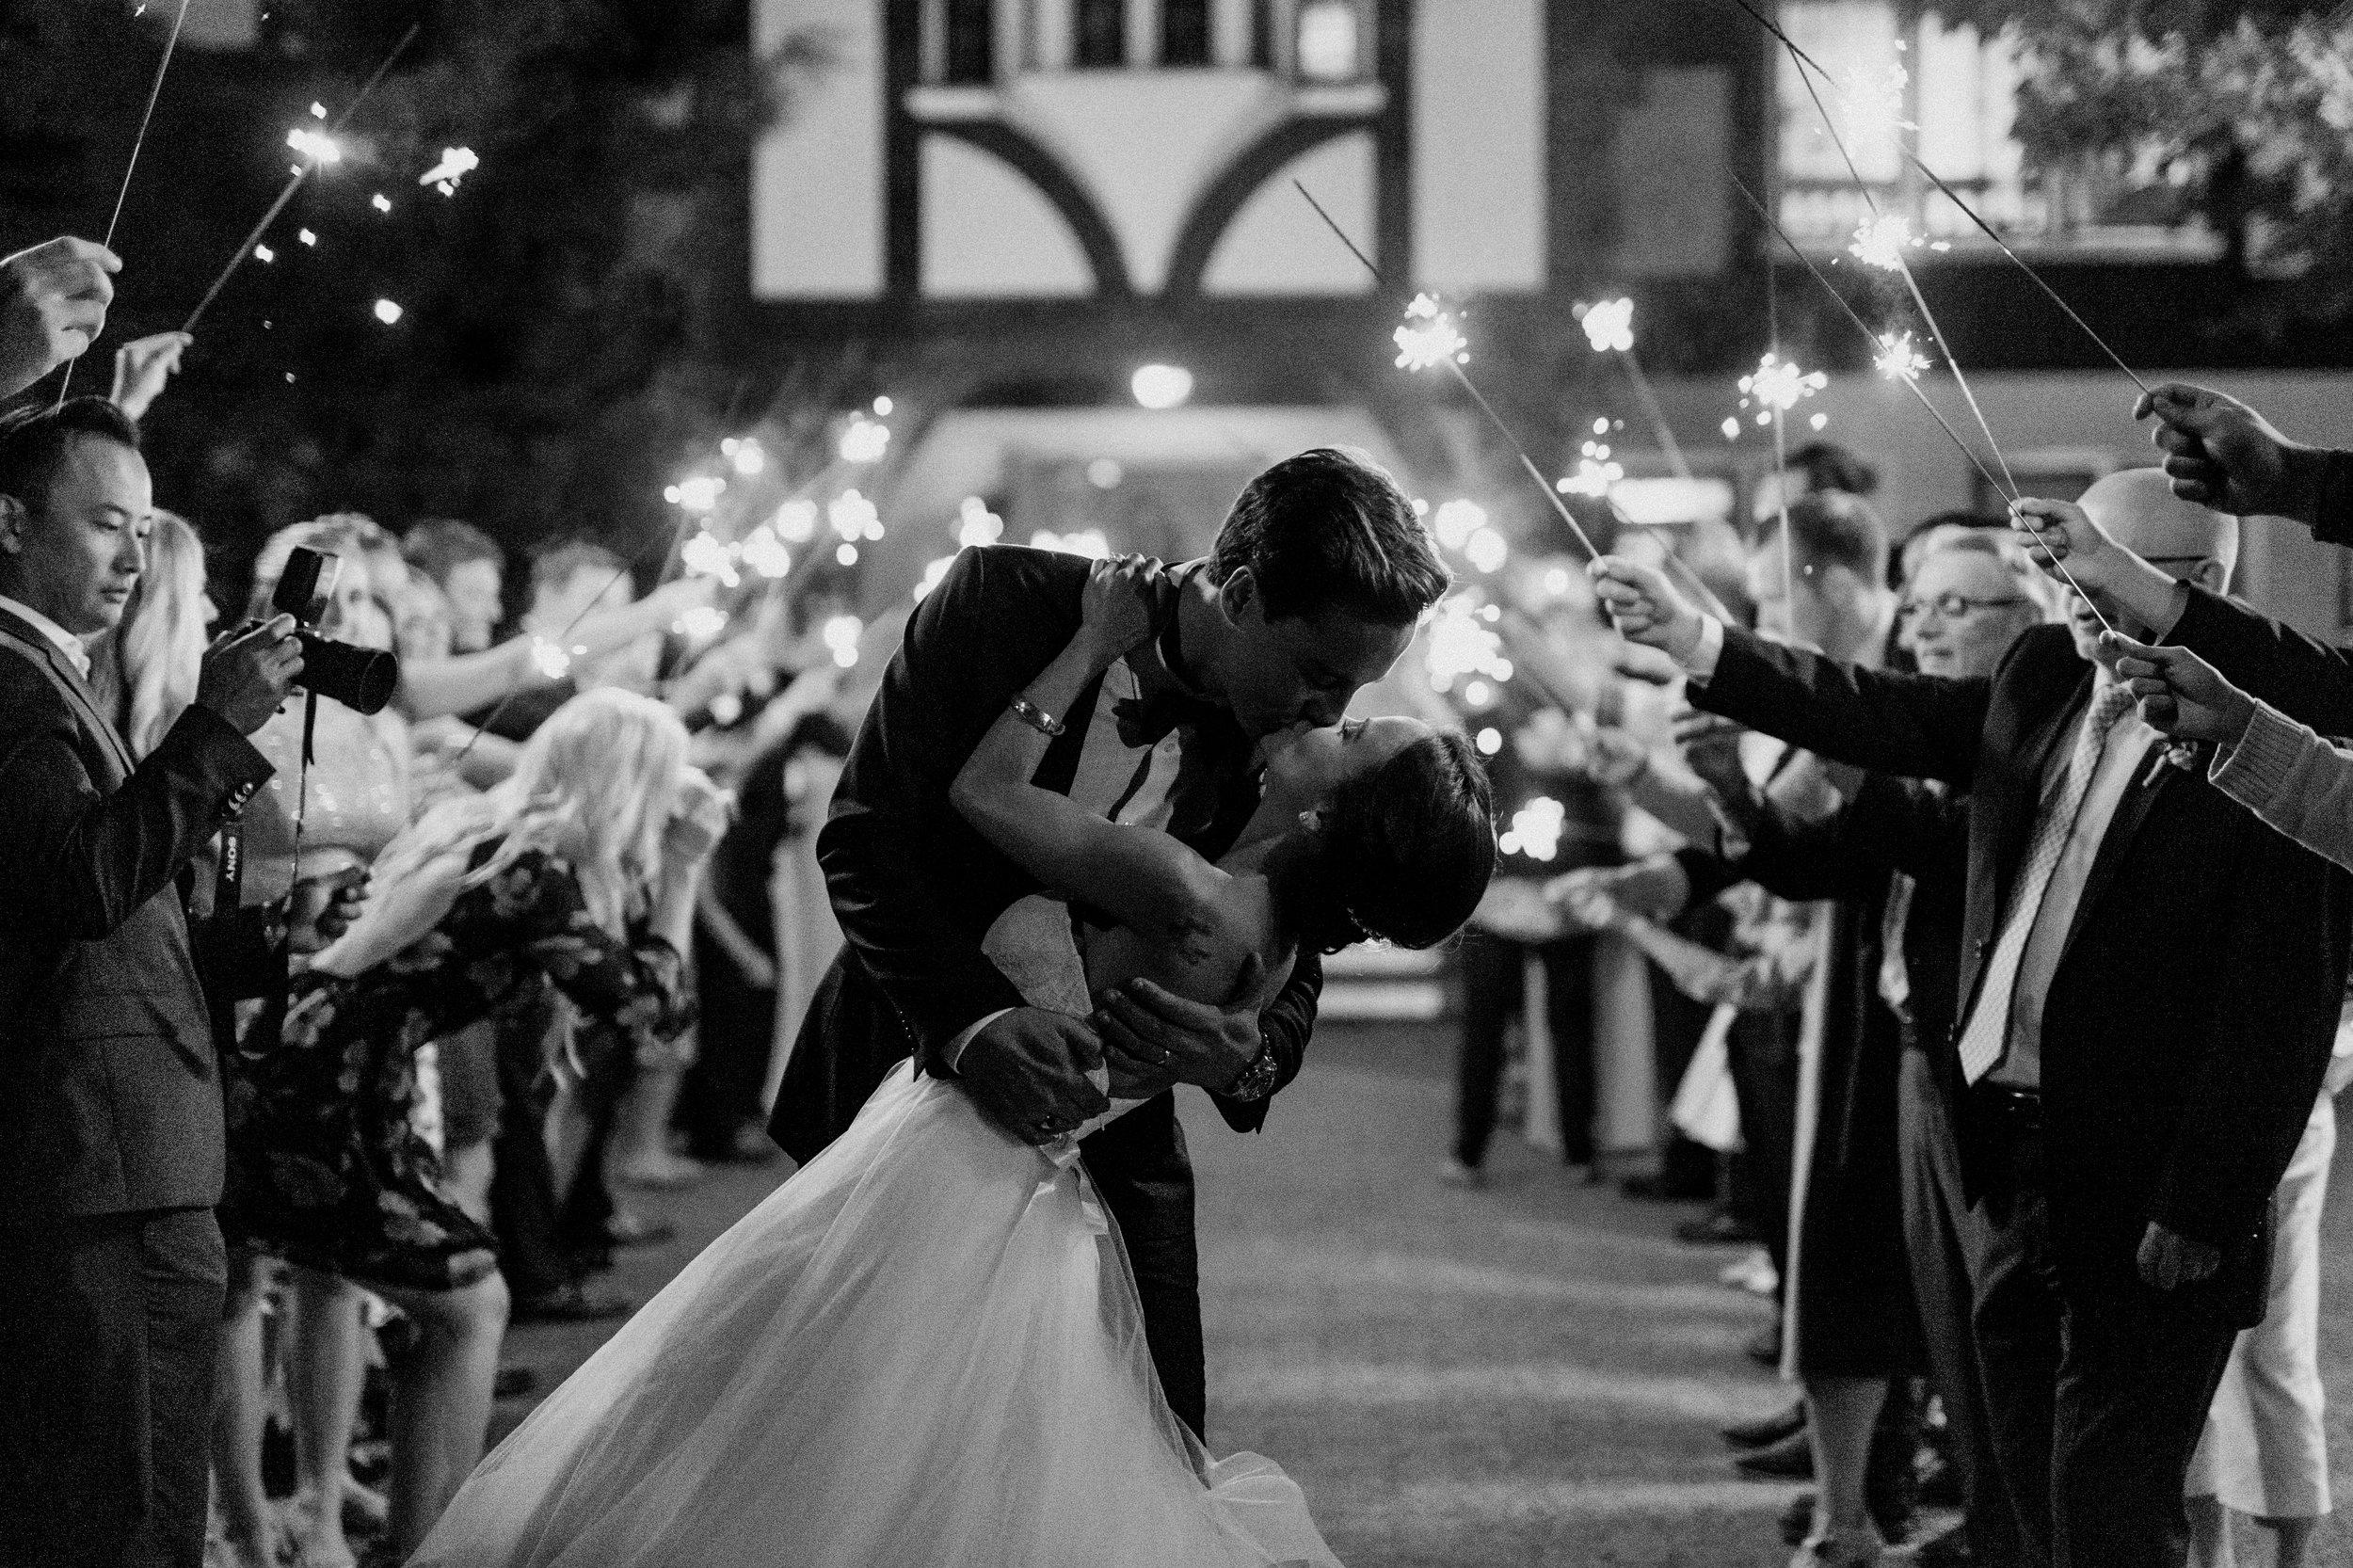 herafilms_carlotta_alex_wedding_hera_highres-68.jpg